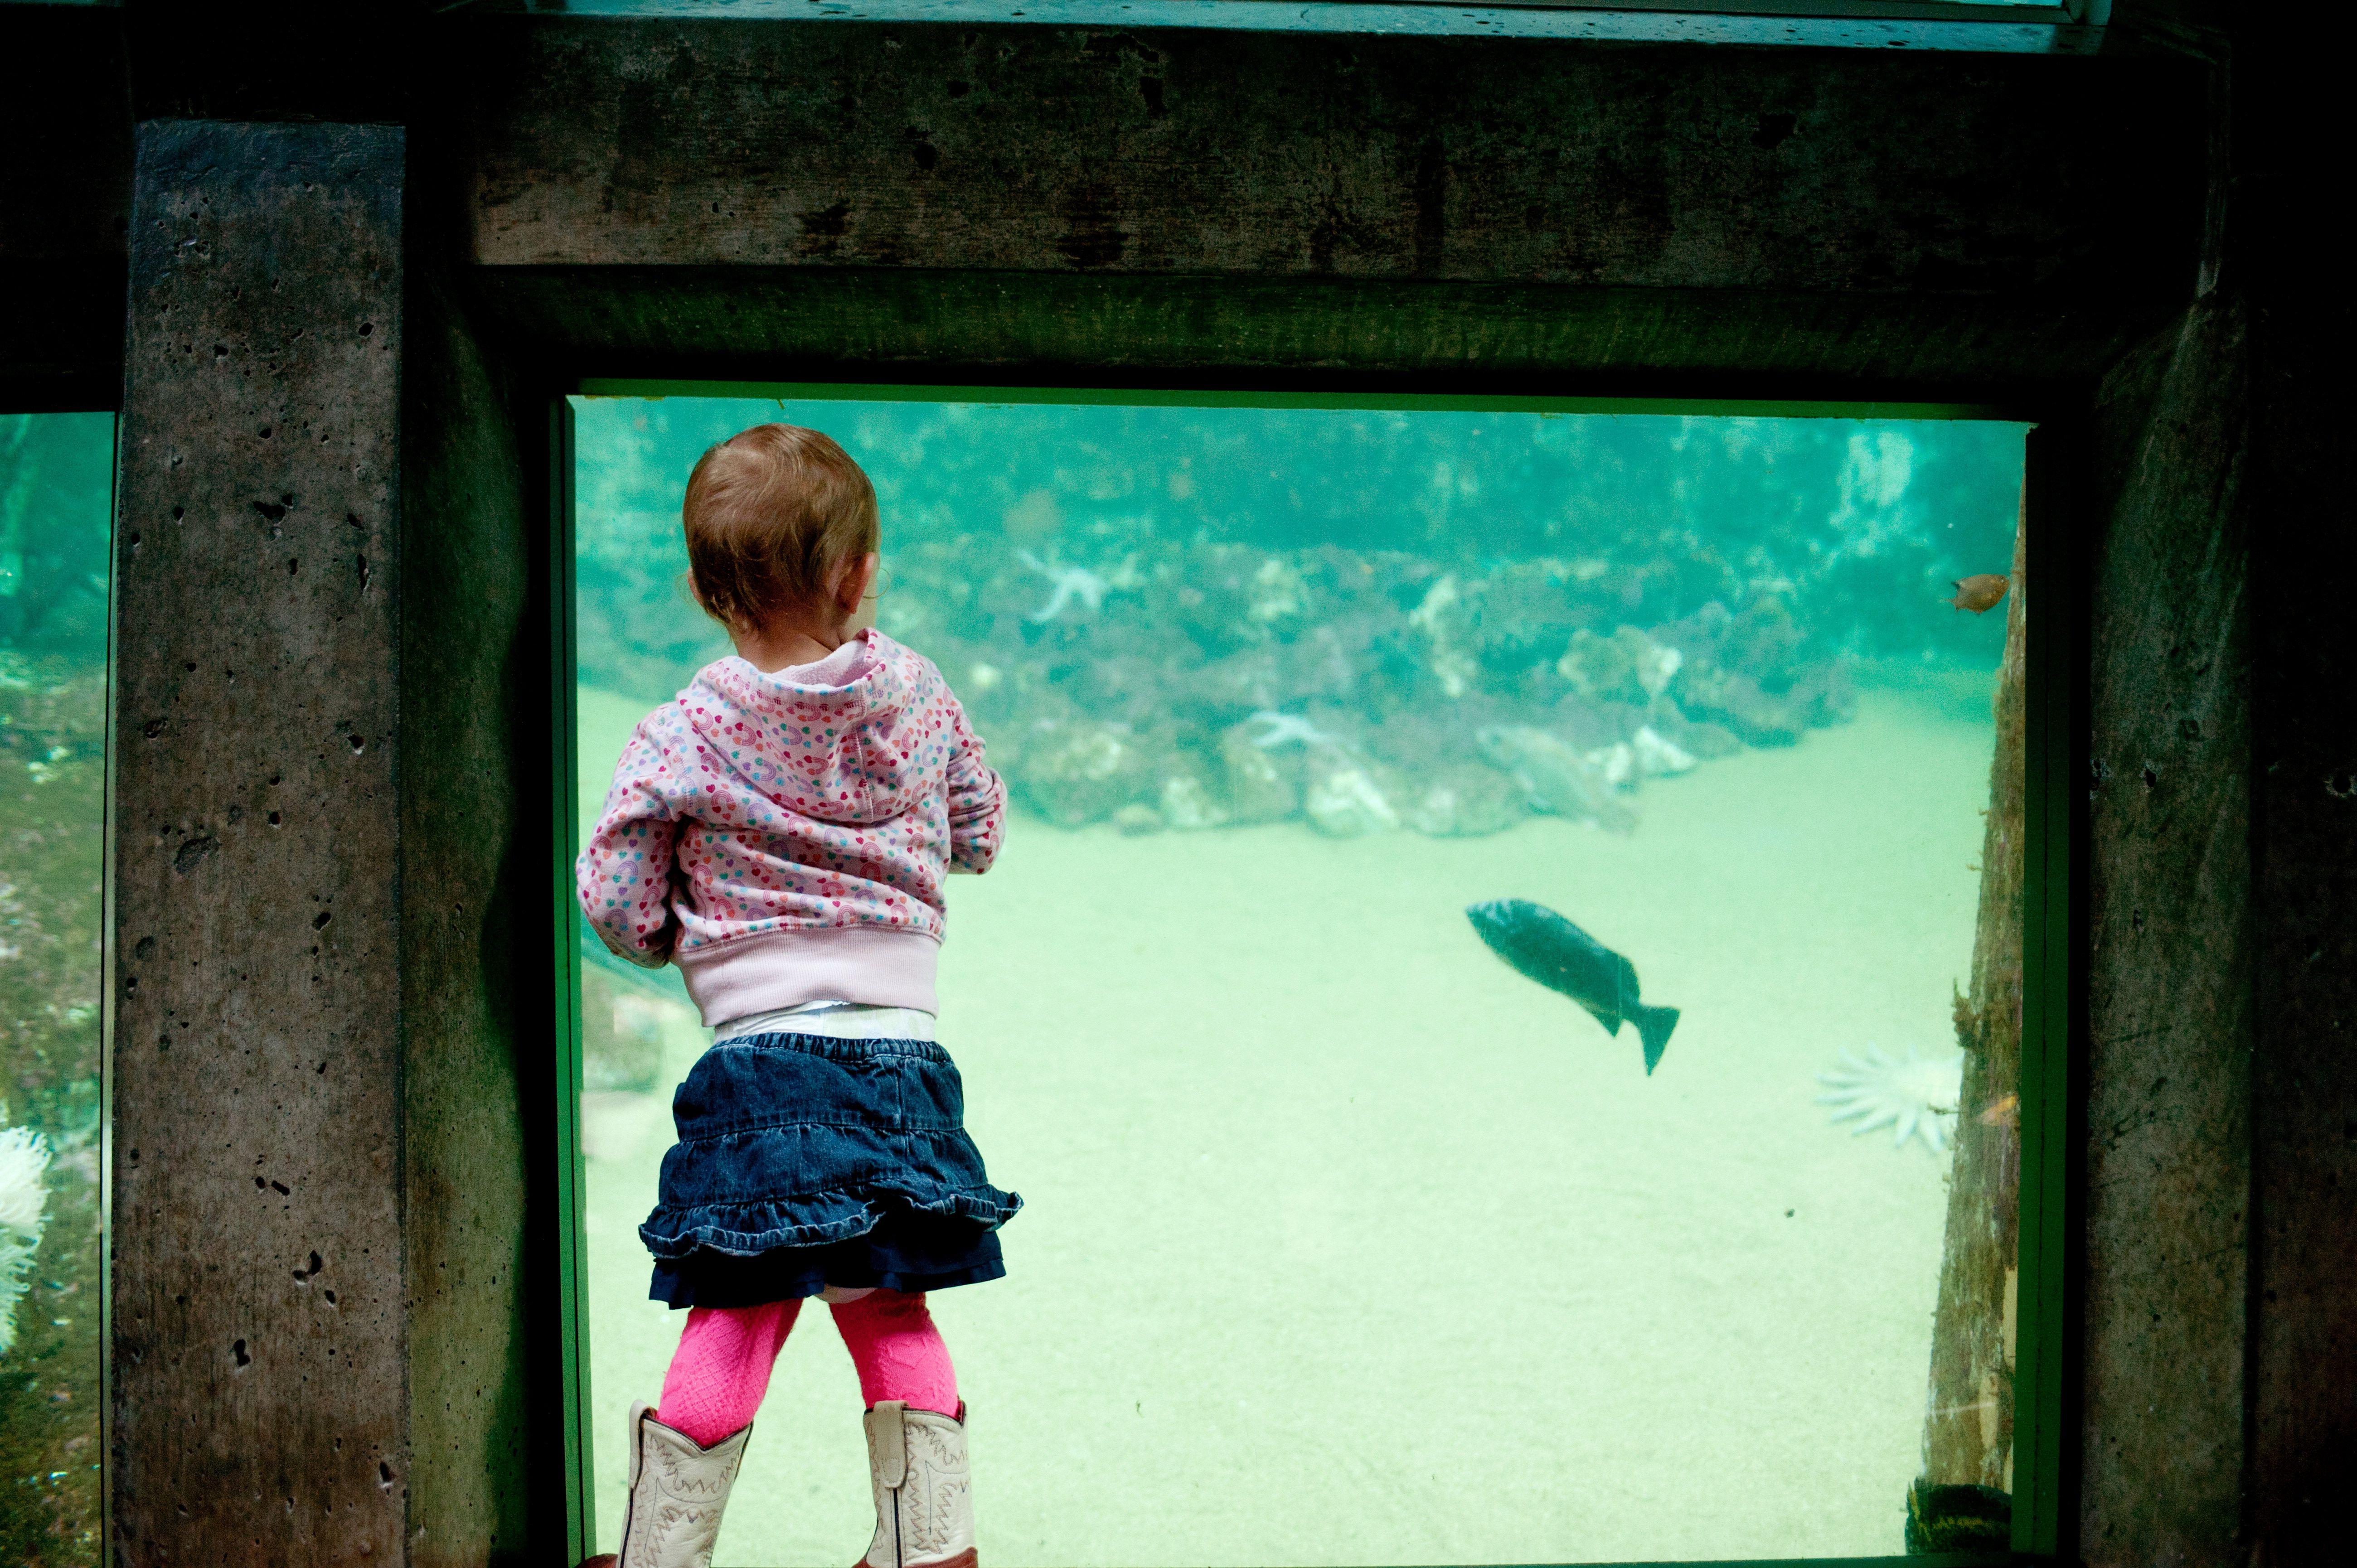 Young girl looking at fish in aquarium